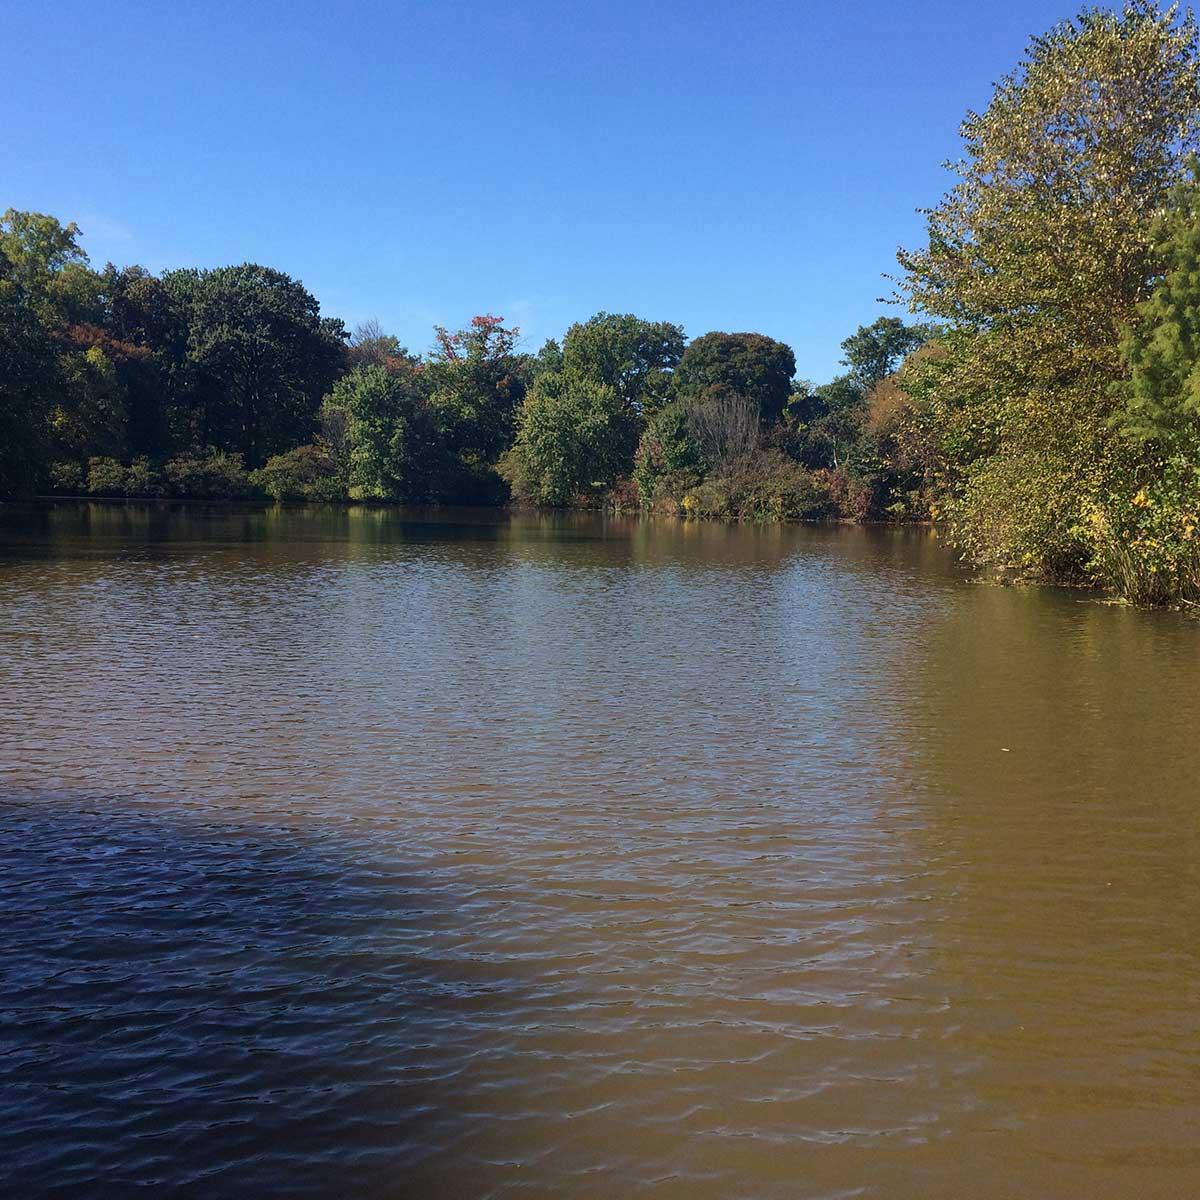 Enjoy the water at Strawbridge Lake Park near Moorestown, NJ.